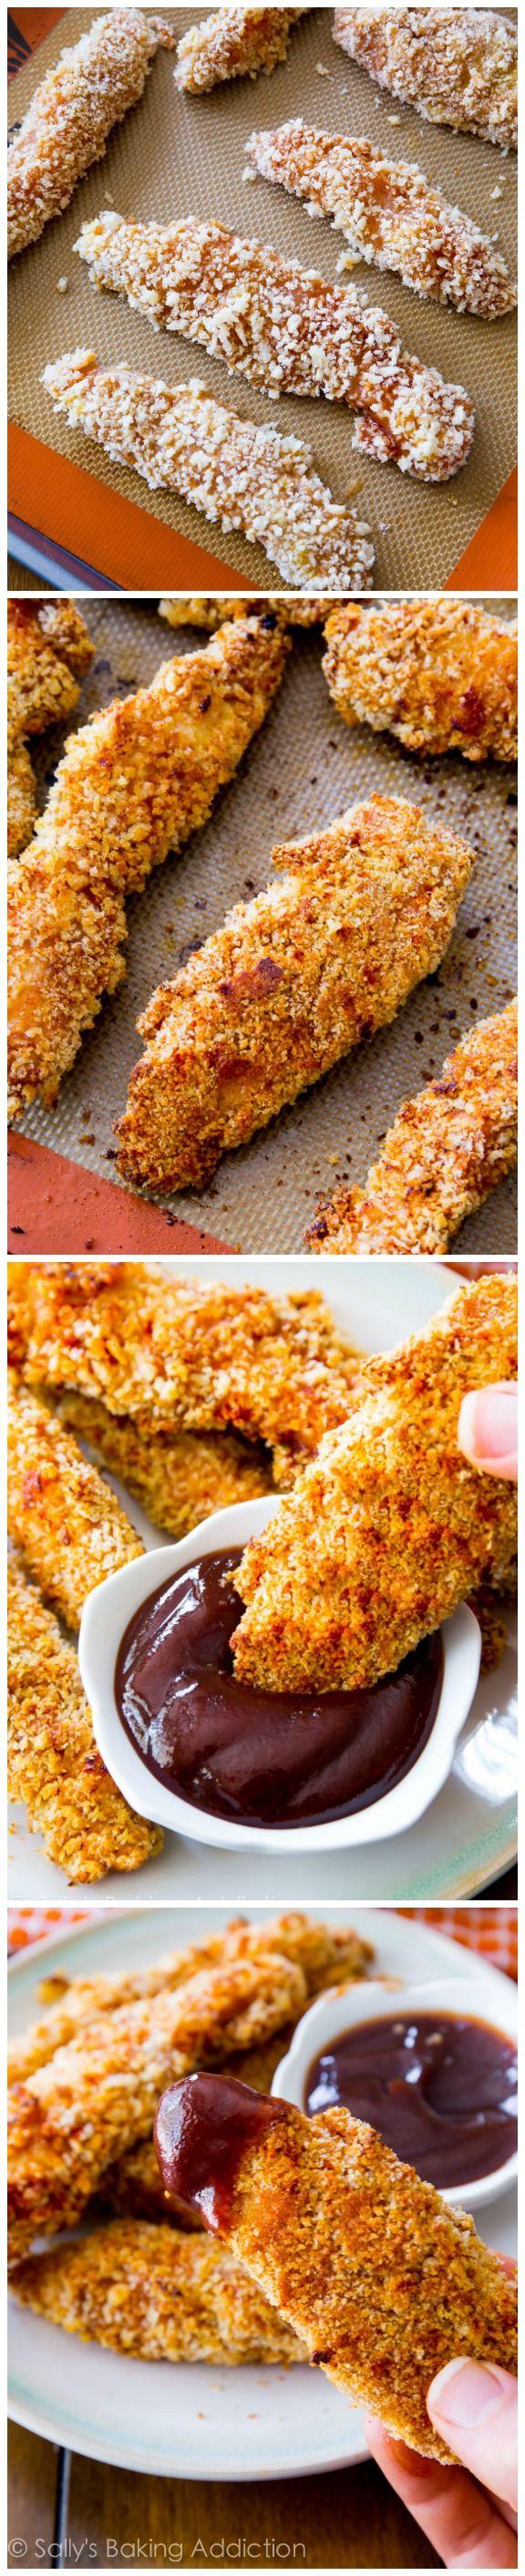 Baked Chicken Fingers @sallybakeblog